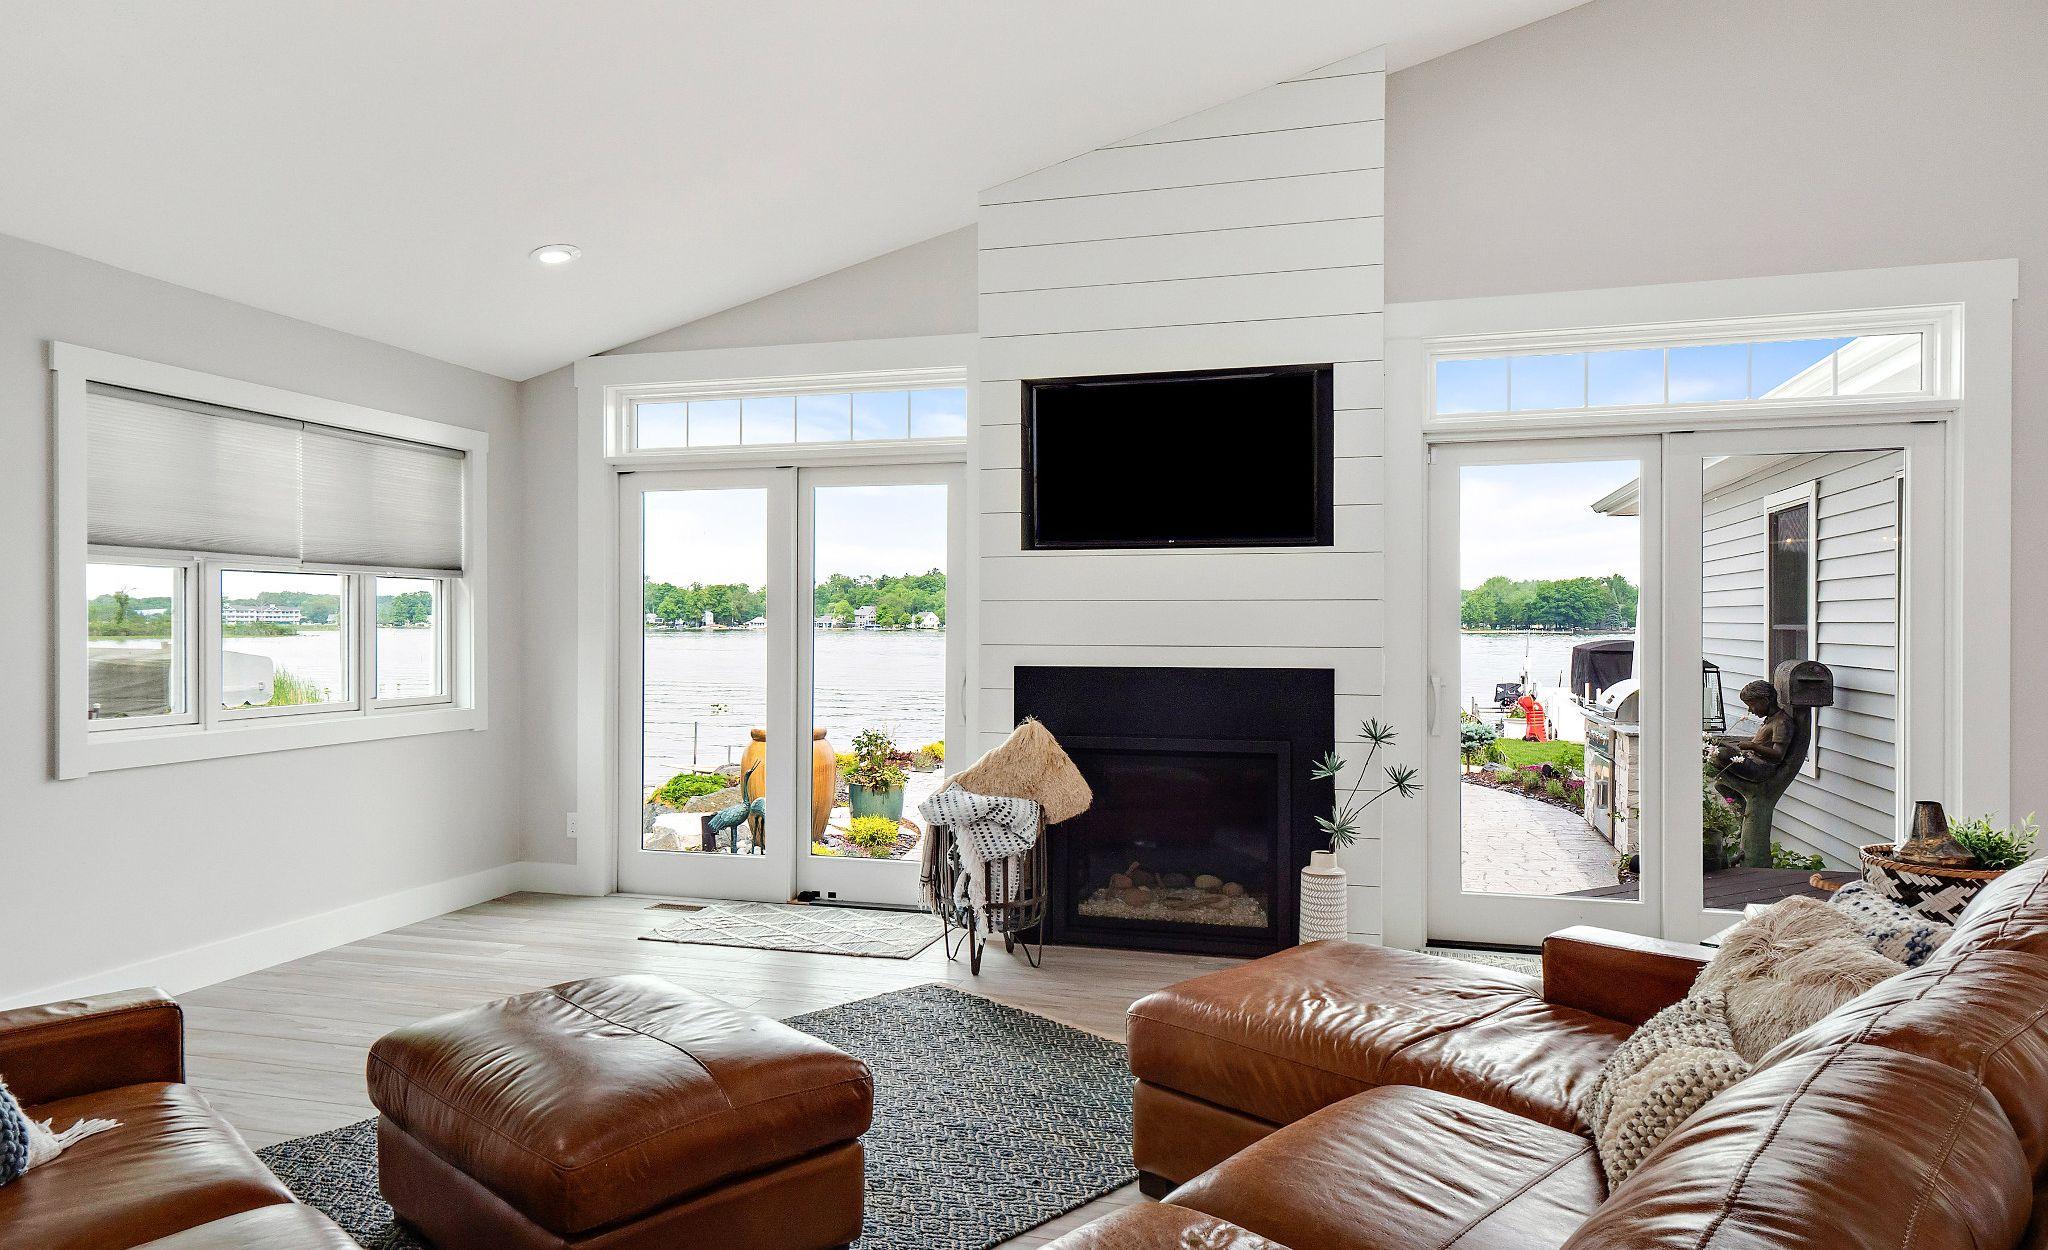 Cambria Black Matte quartz fireplace surround in a white living room.